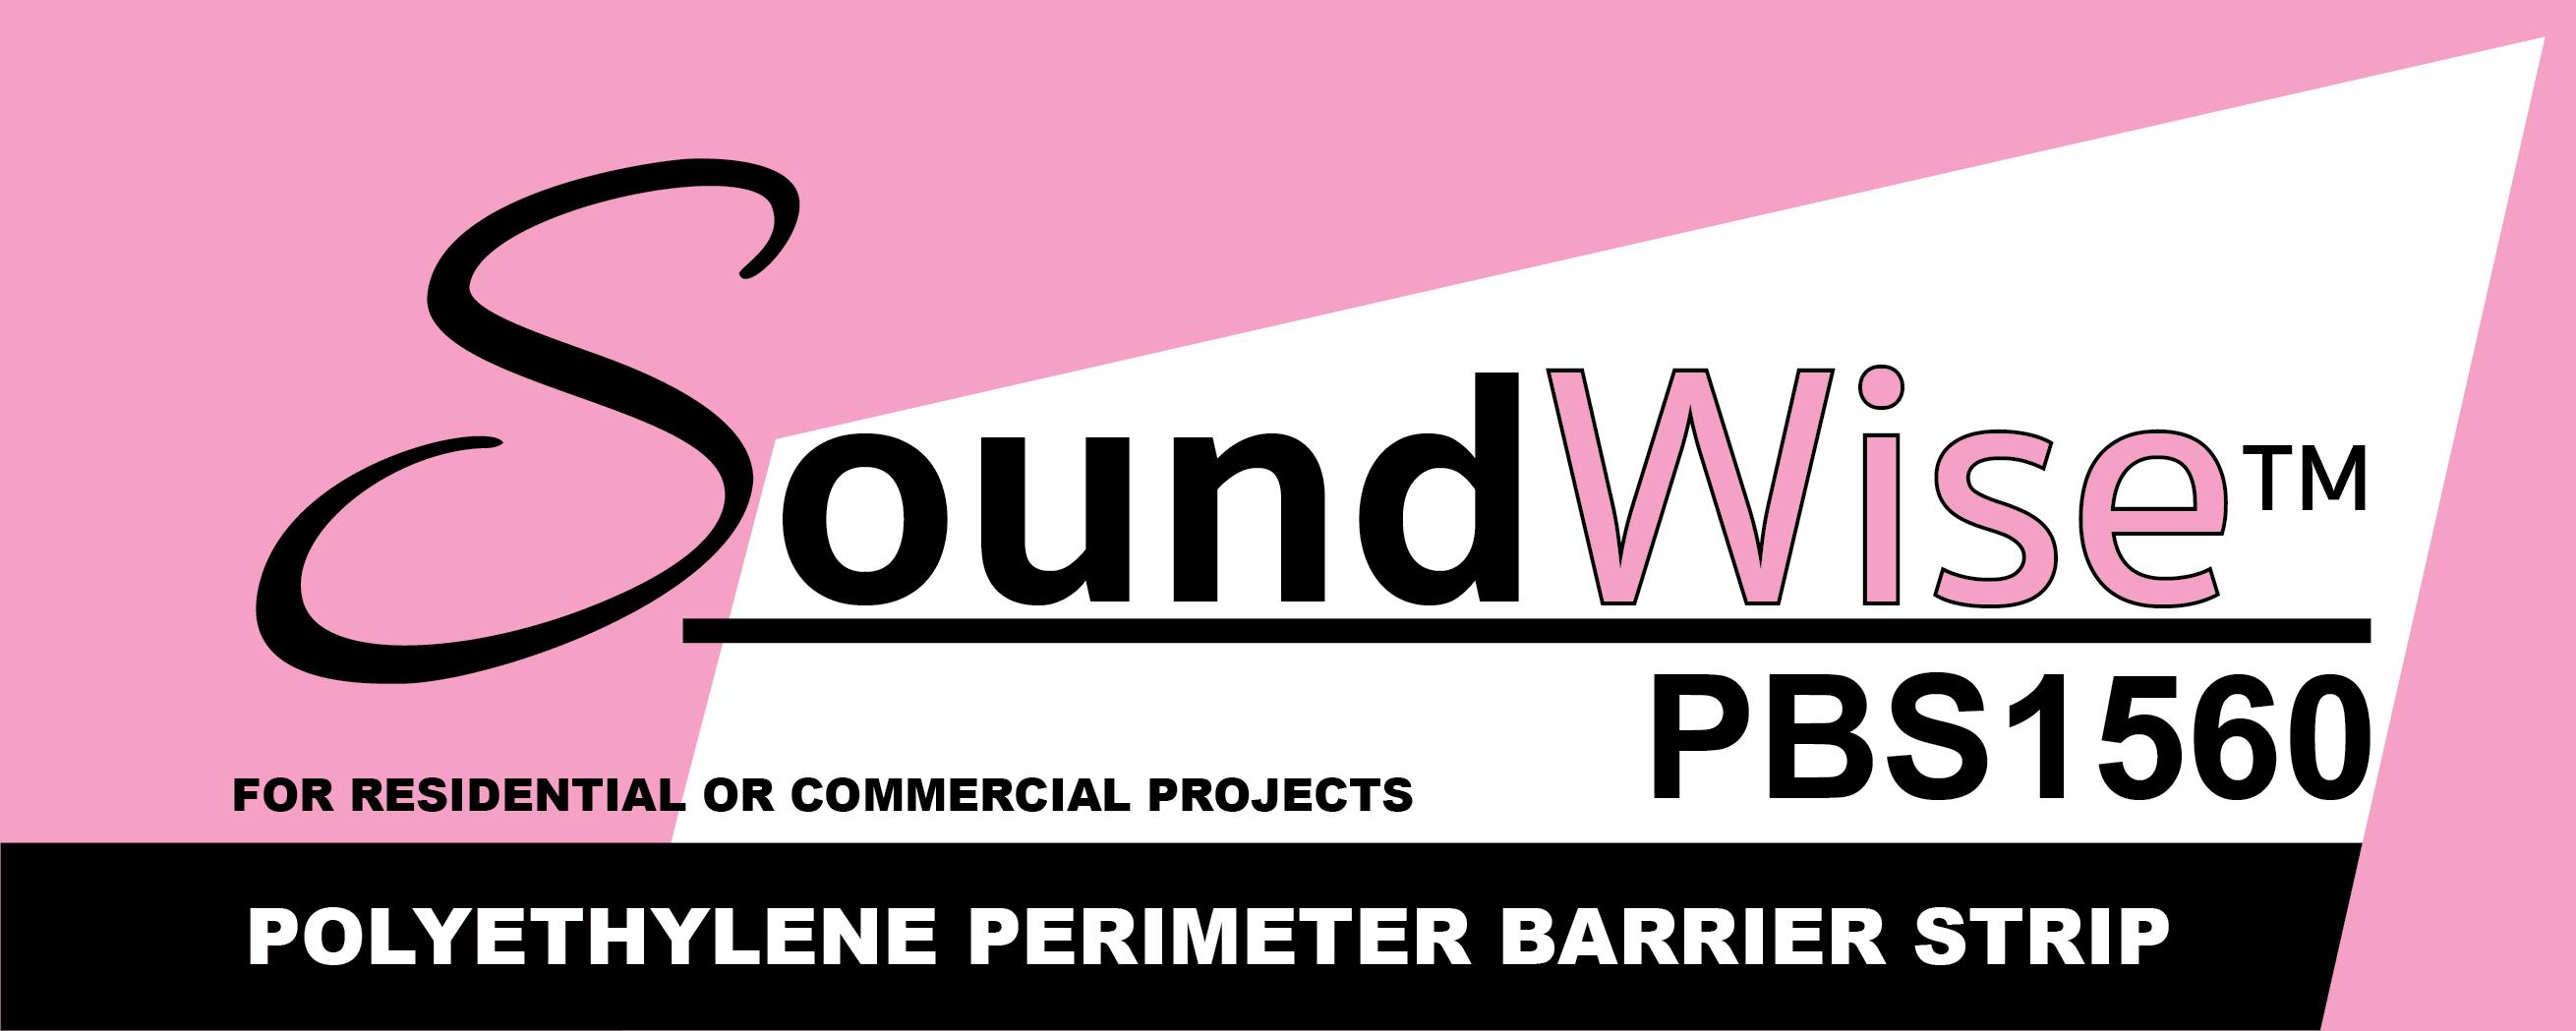 Soundwise™ PBS 1560 Polyethylene Perimeter Barrier Strip